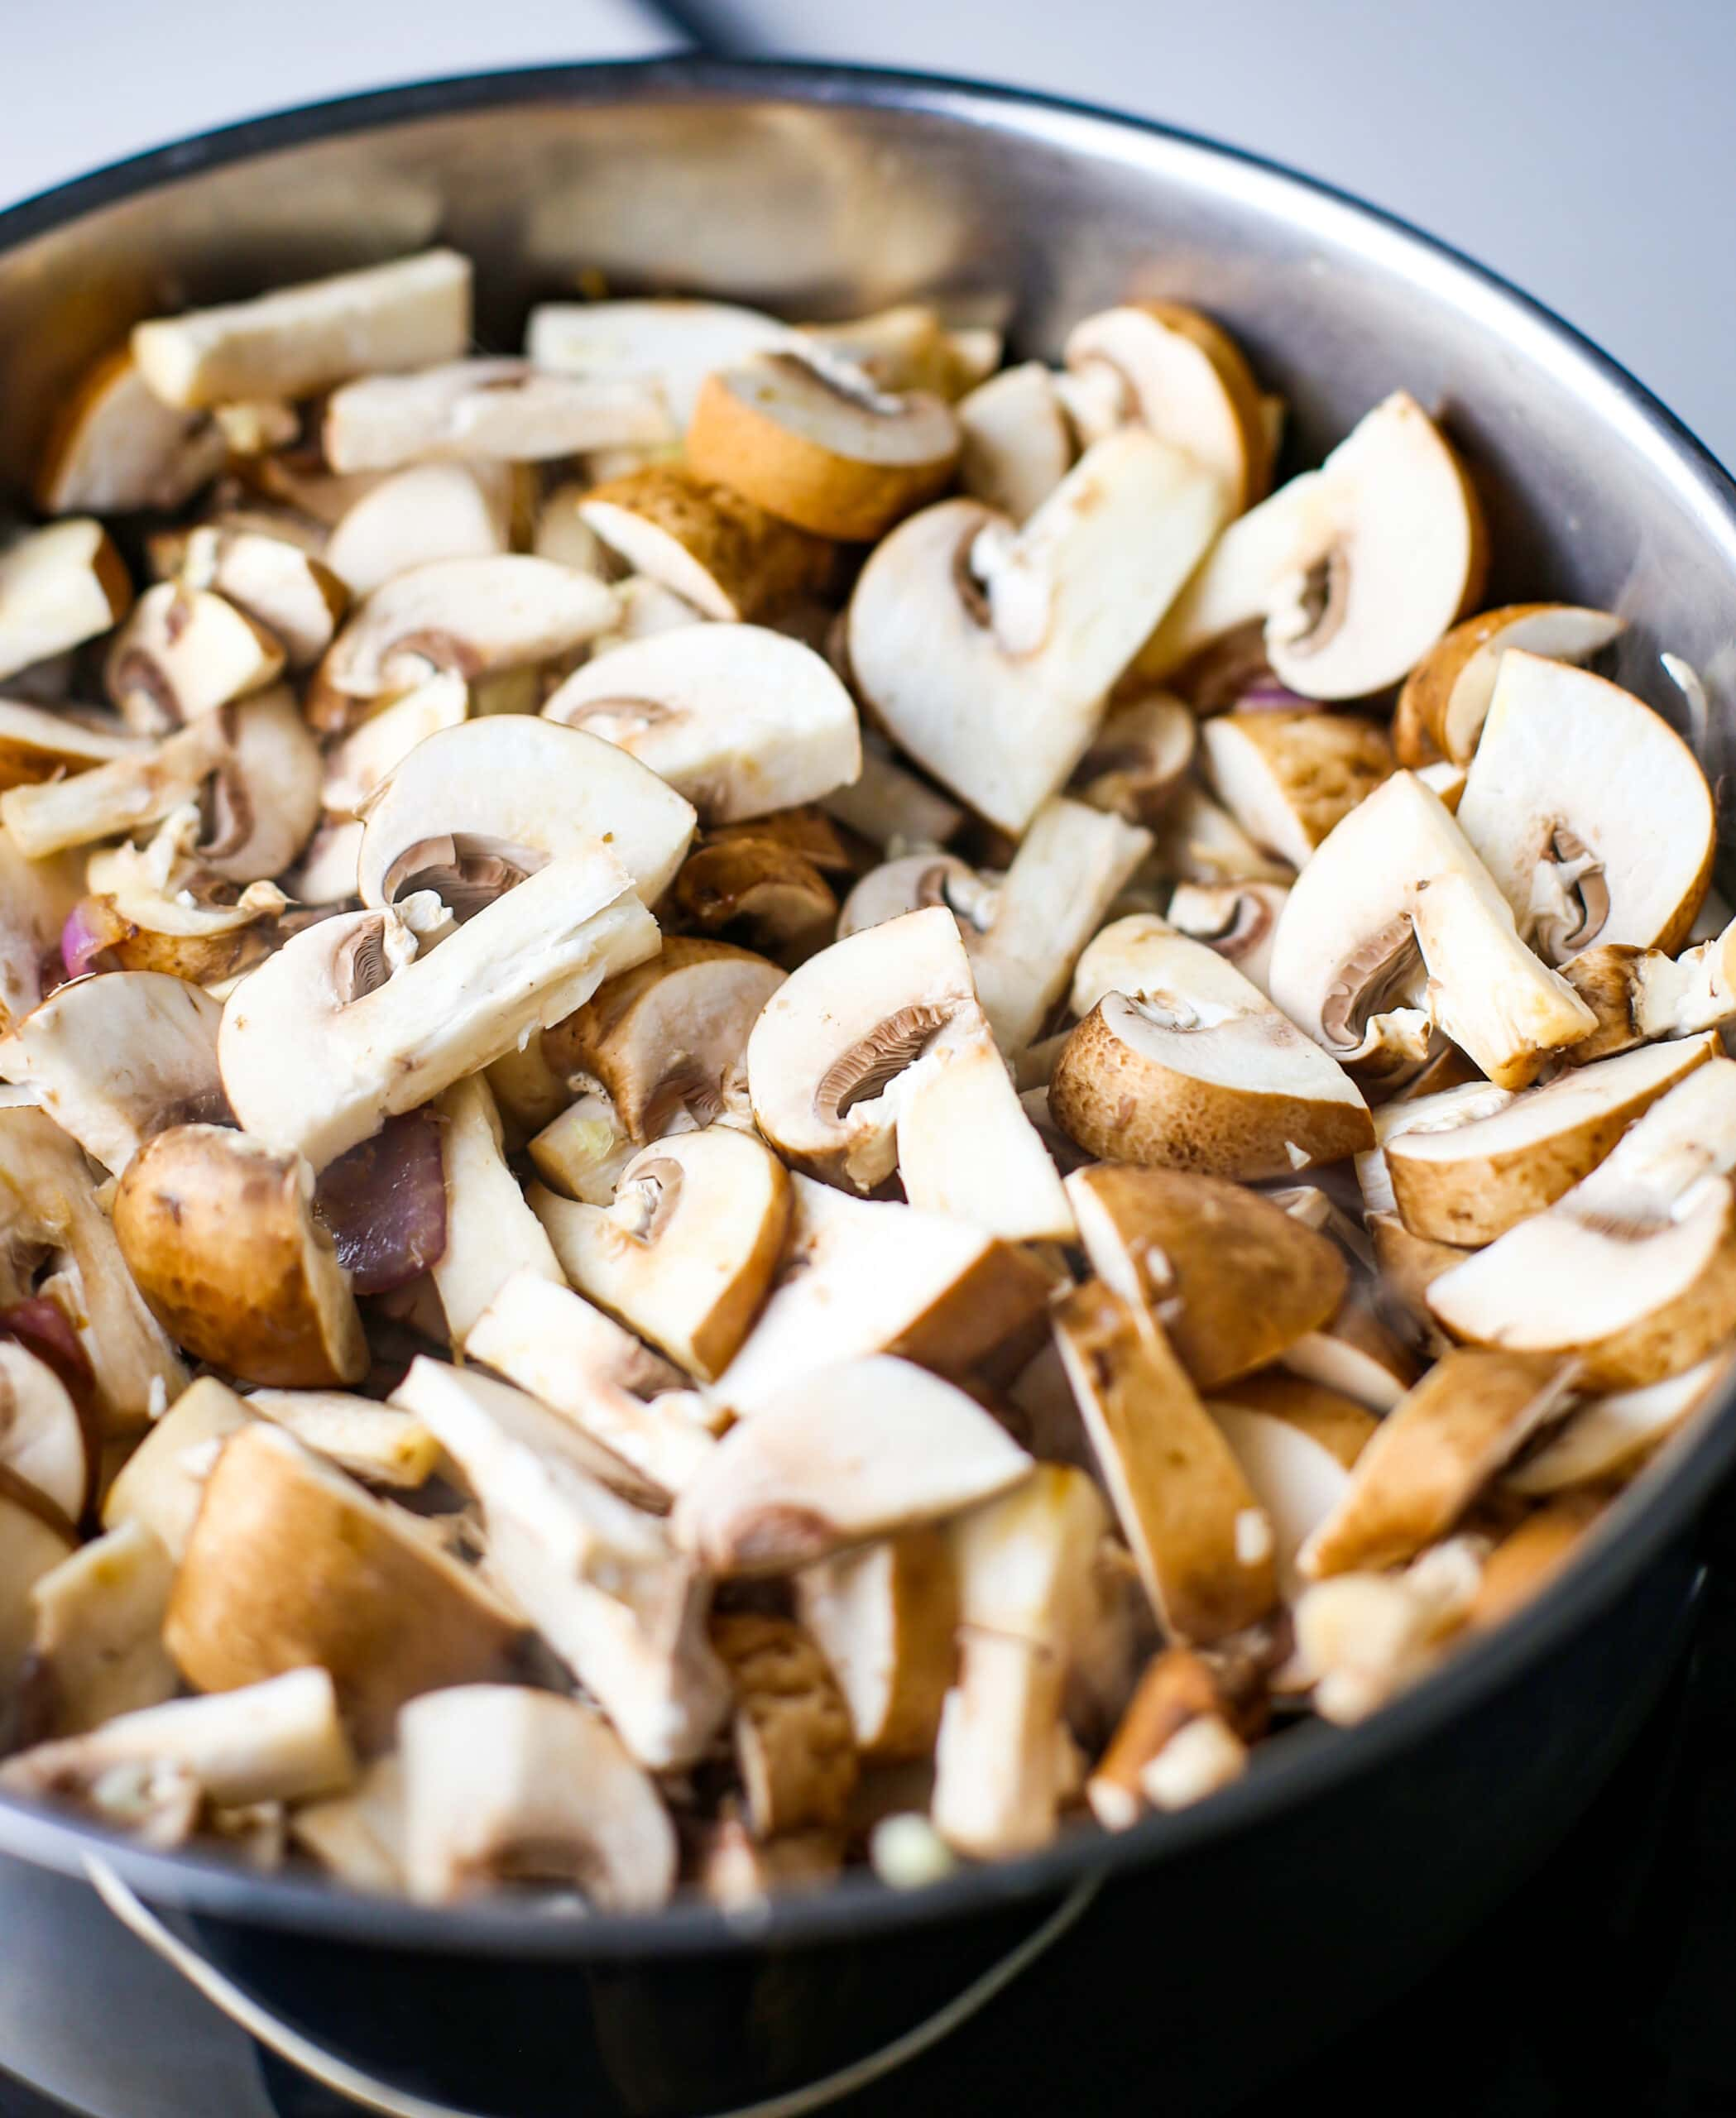 Sliced cremini mushrooms in a stainless steel saucepan.